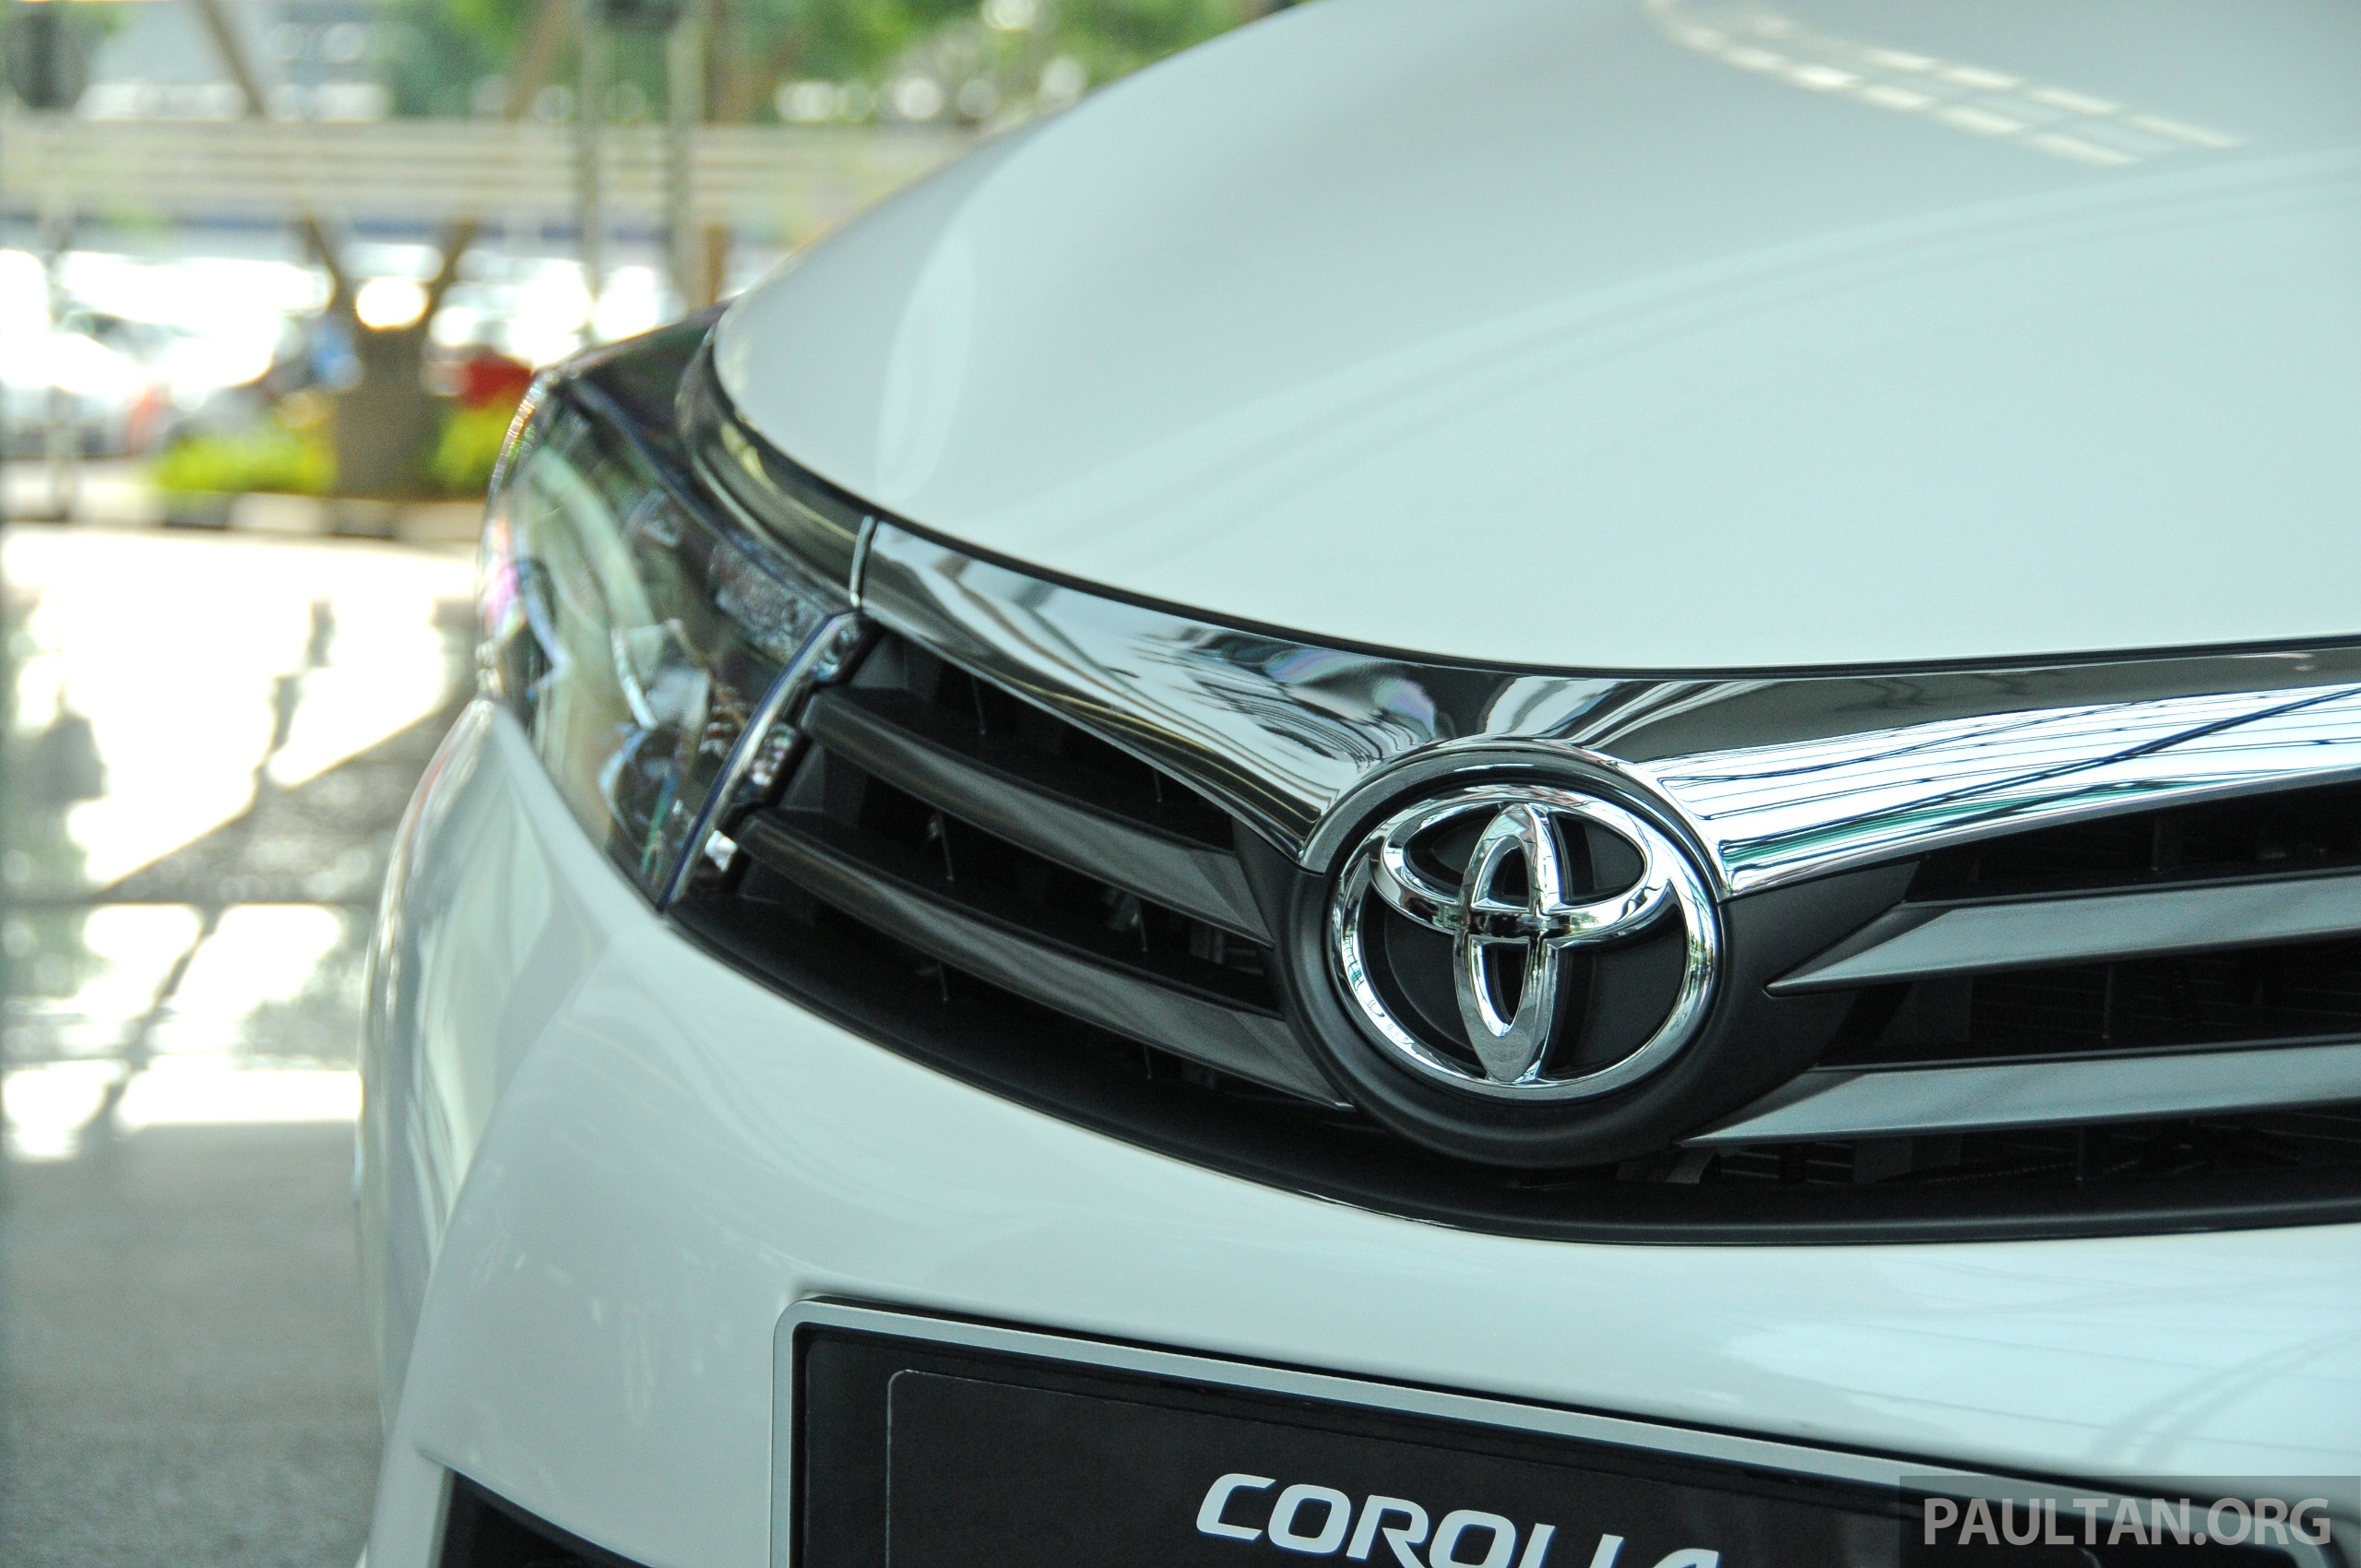 Honda Crv Repair History And Reliability Upcomingcarshq Com